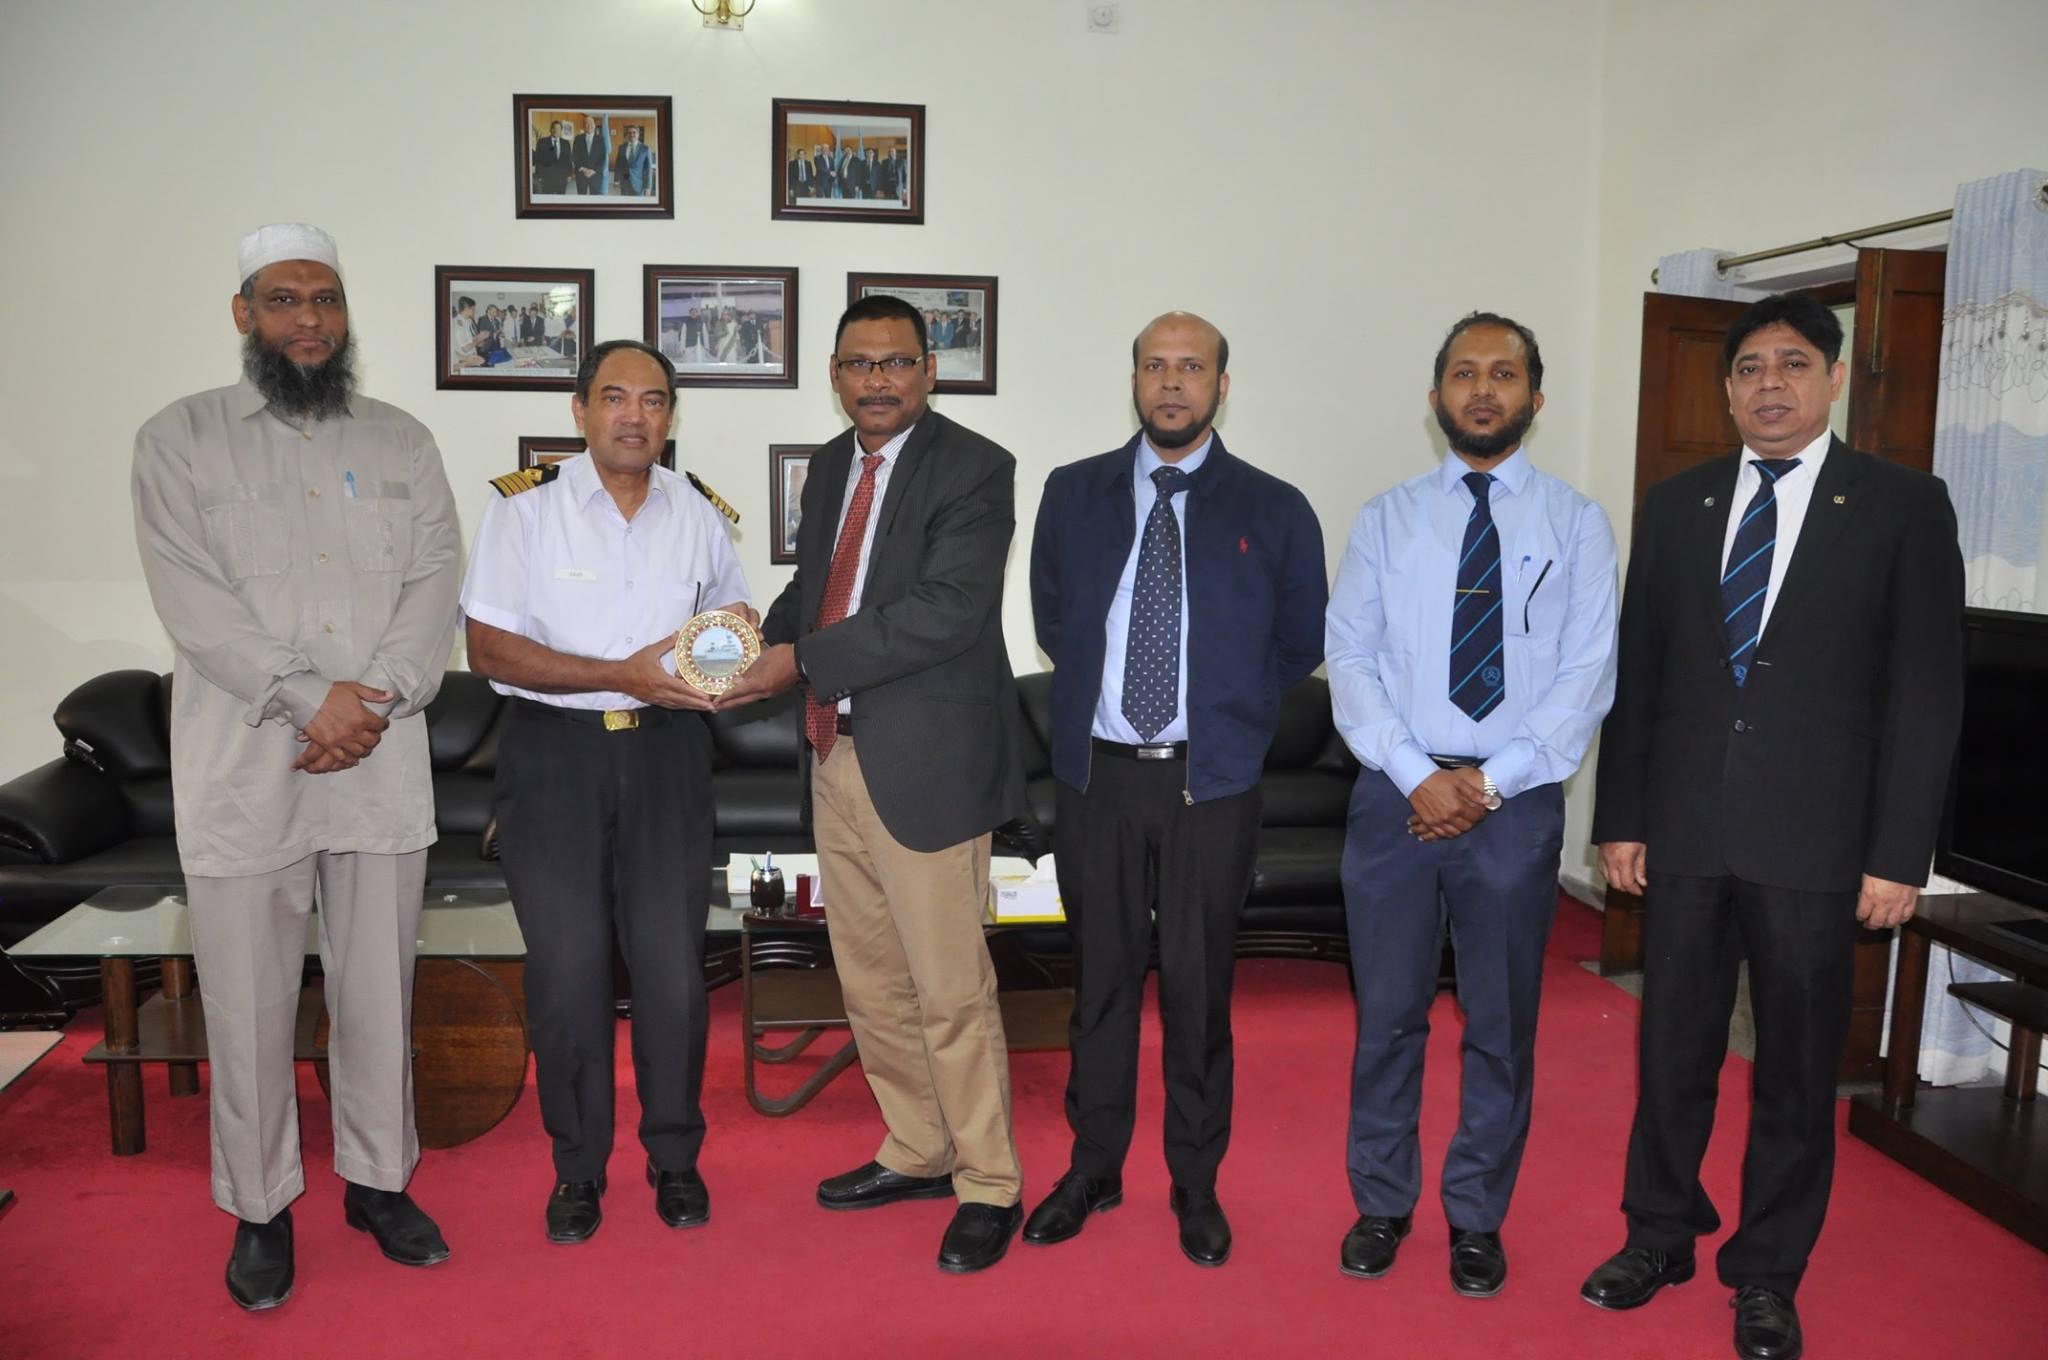 Vice Principal, TMI India visited our Academy on 20 Nov 2018